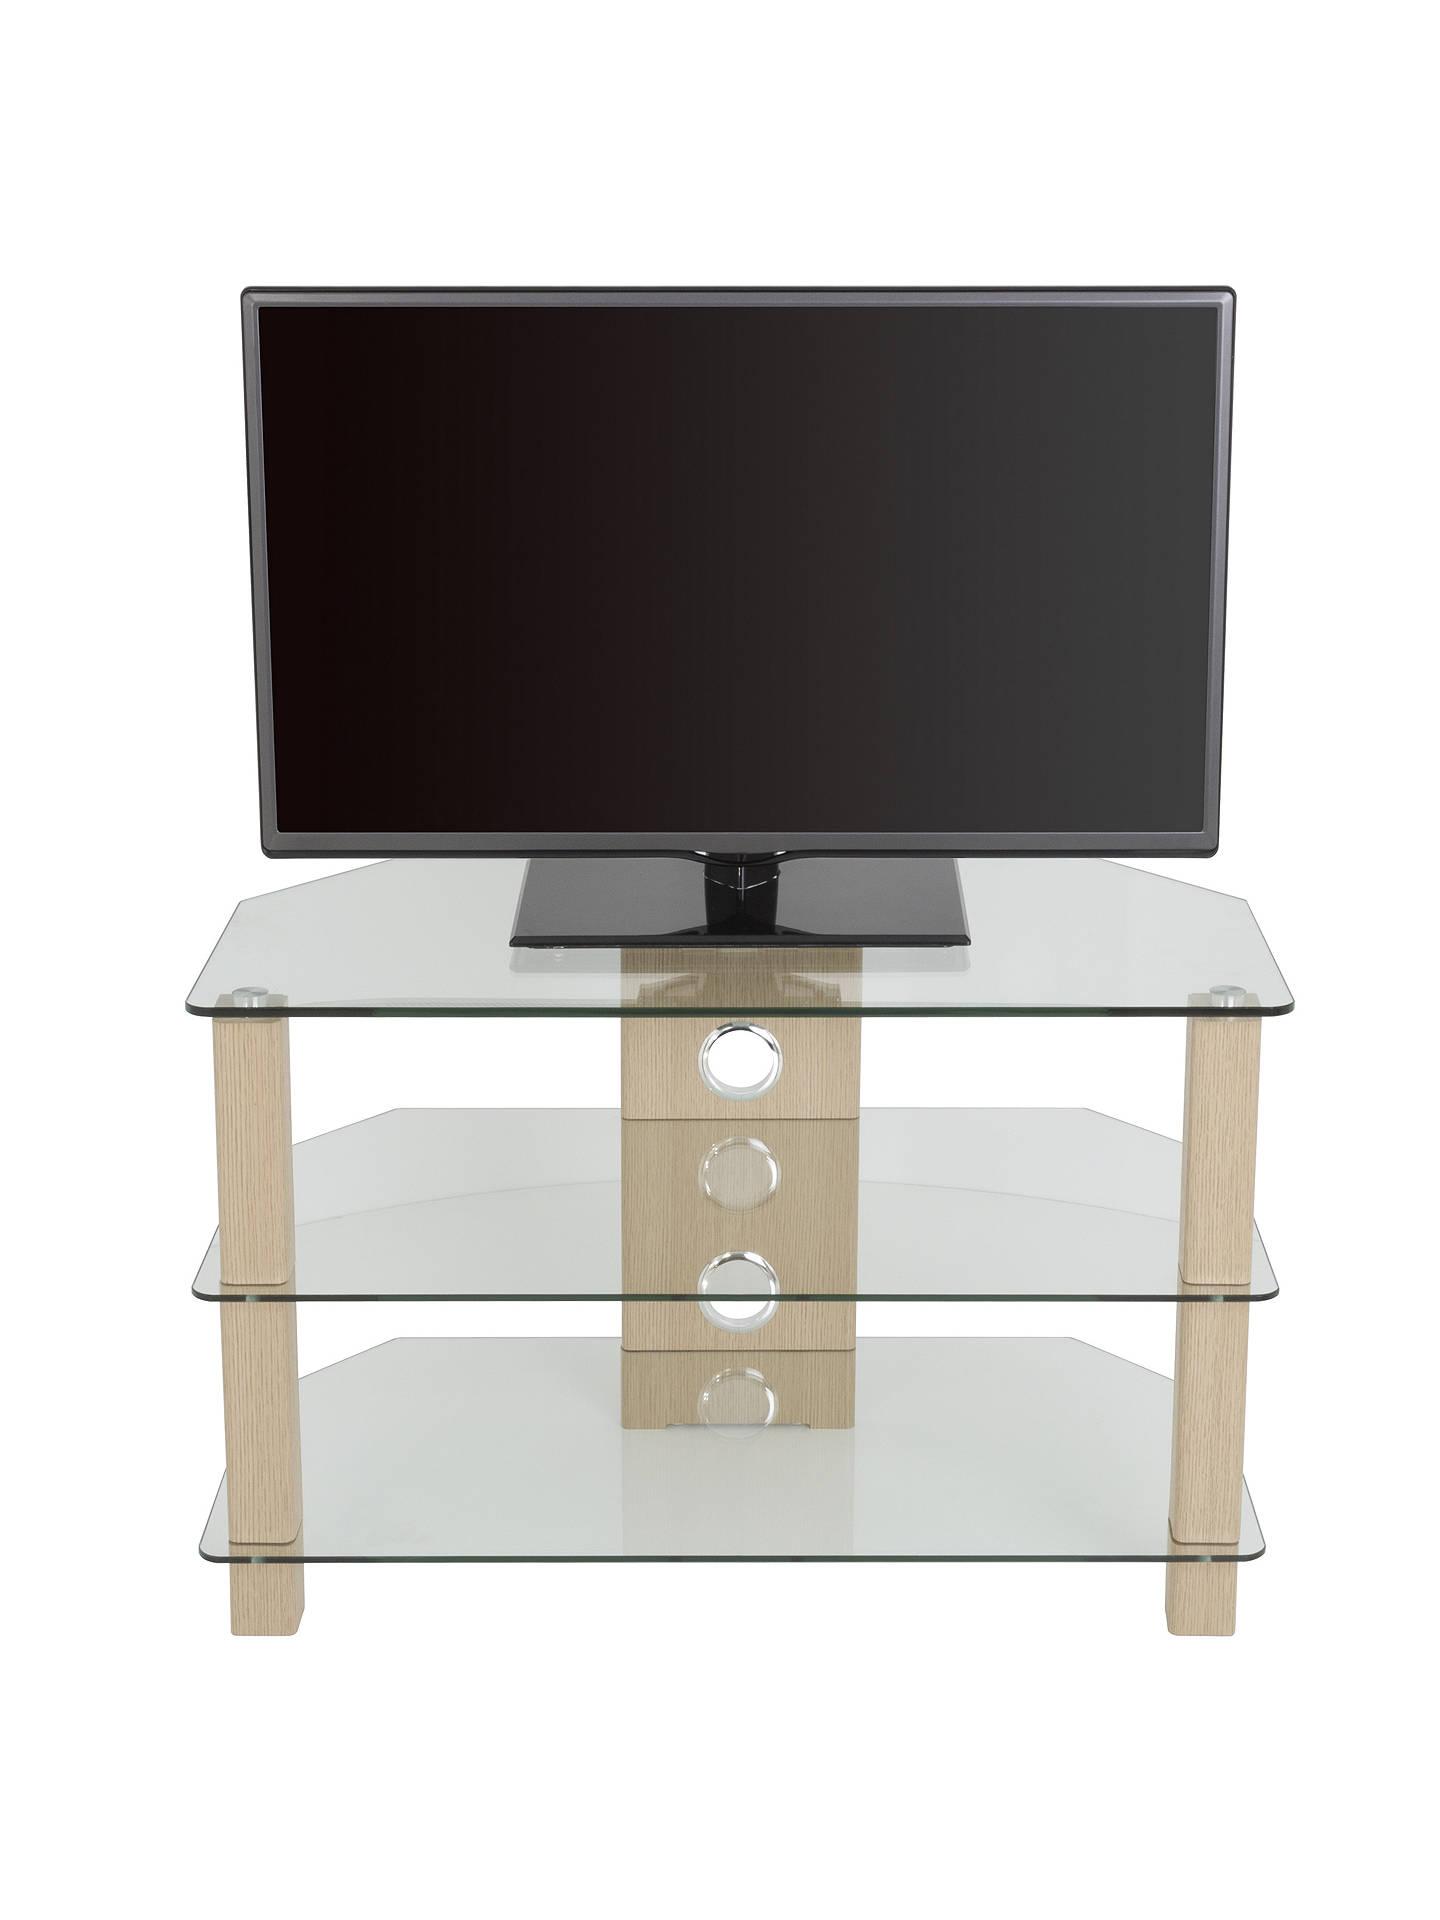 0b3dfa576cda John Lewis & Partners WG800 TV Stand for TVs up to 40